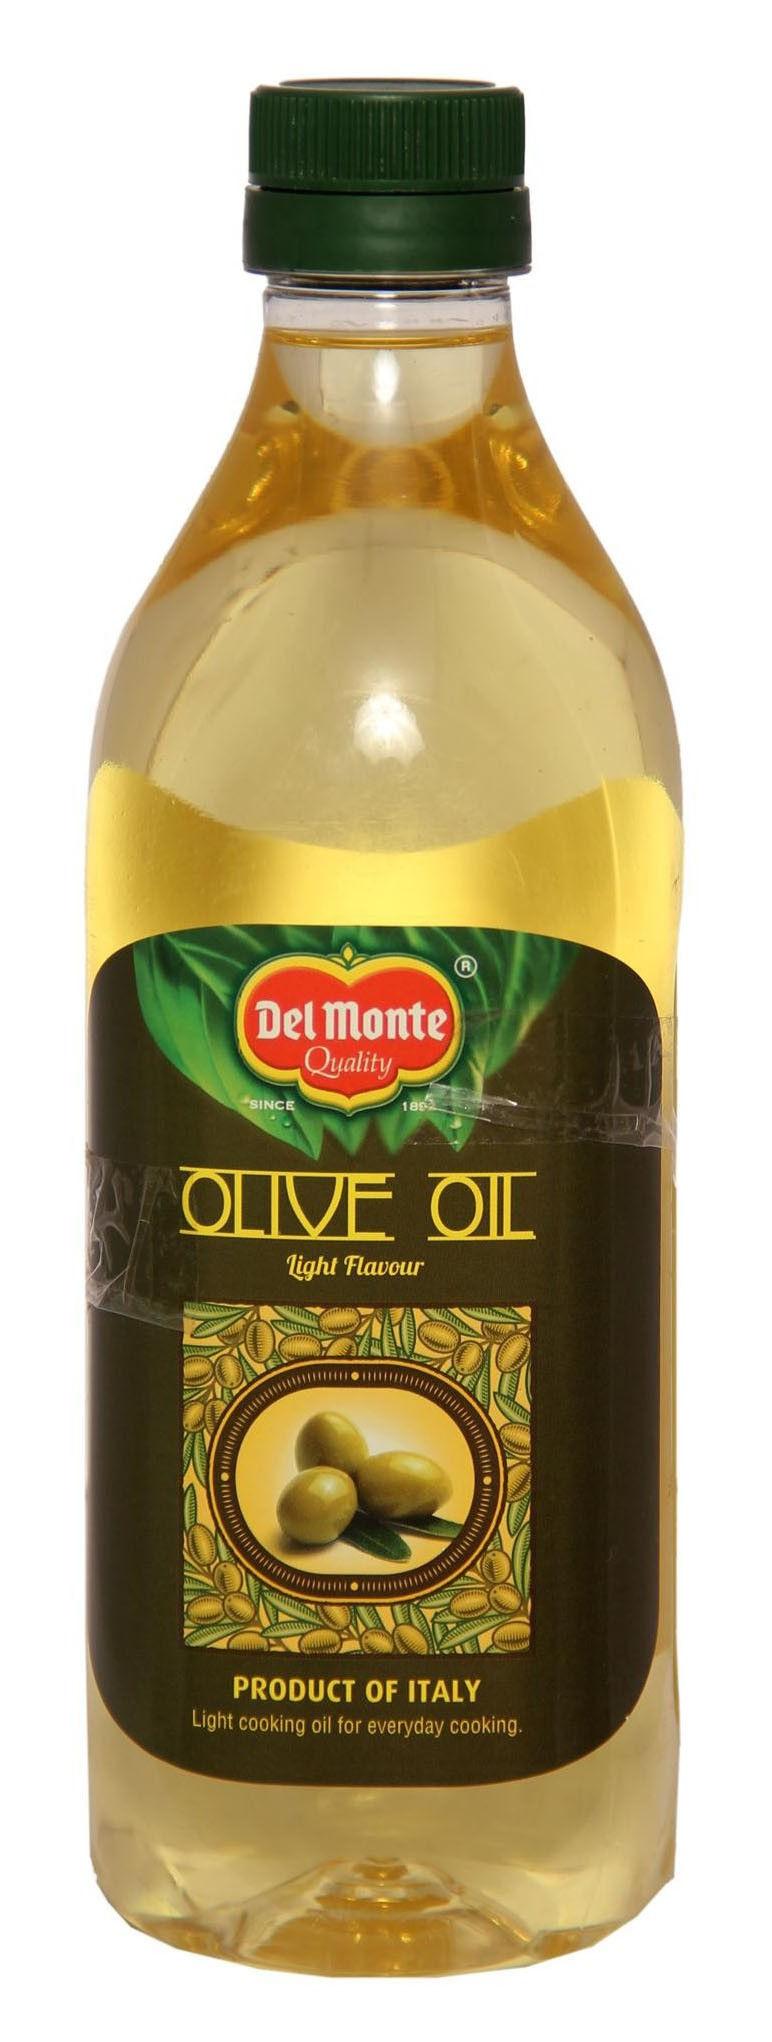 Del monte Olive Oil Light